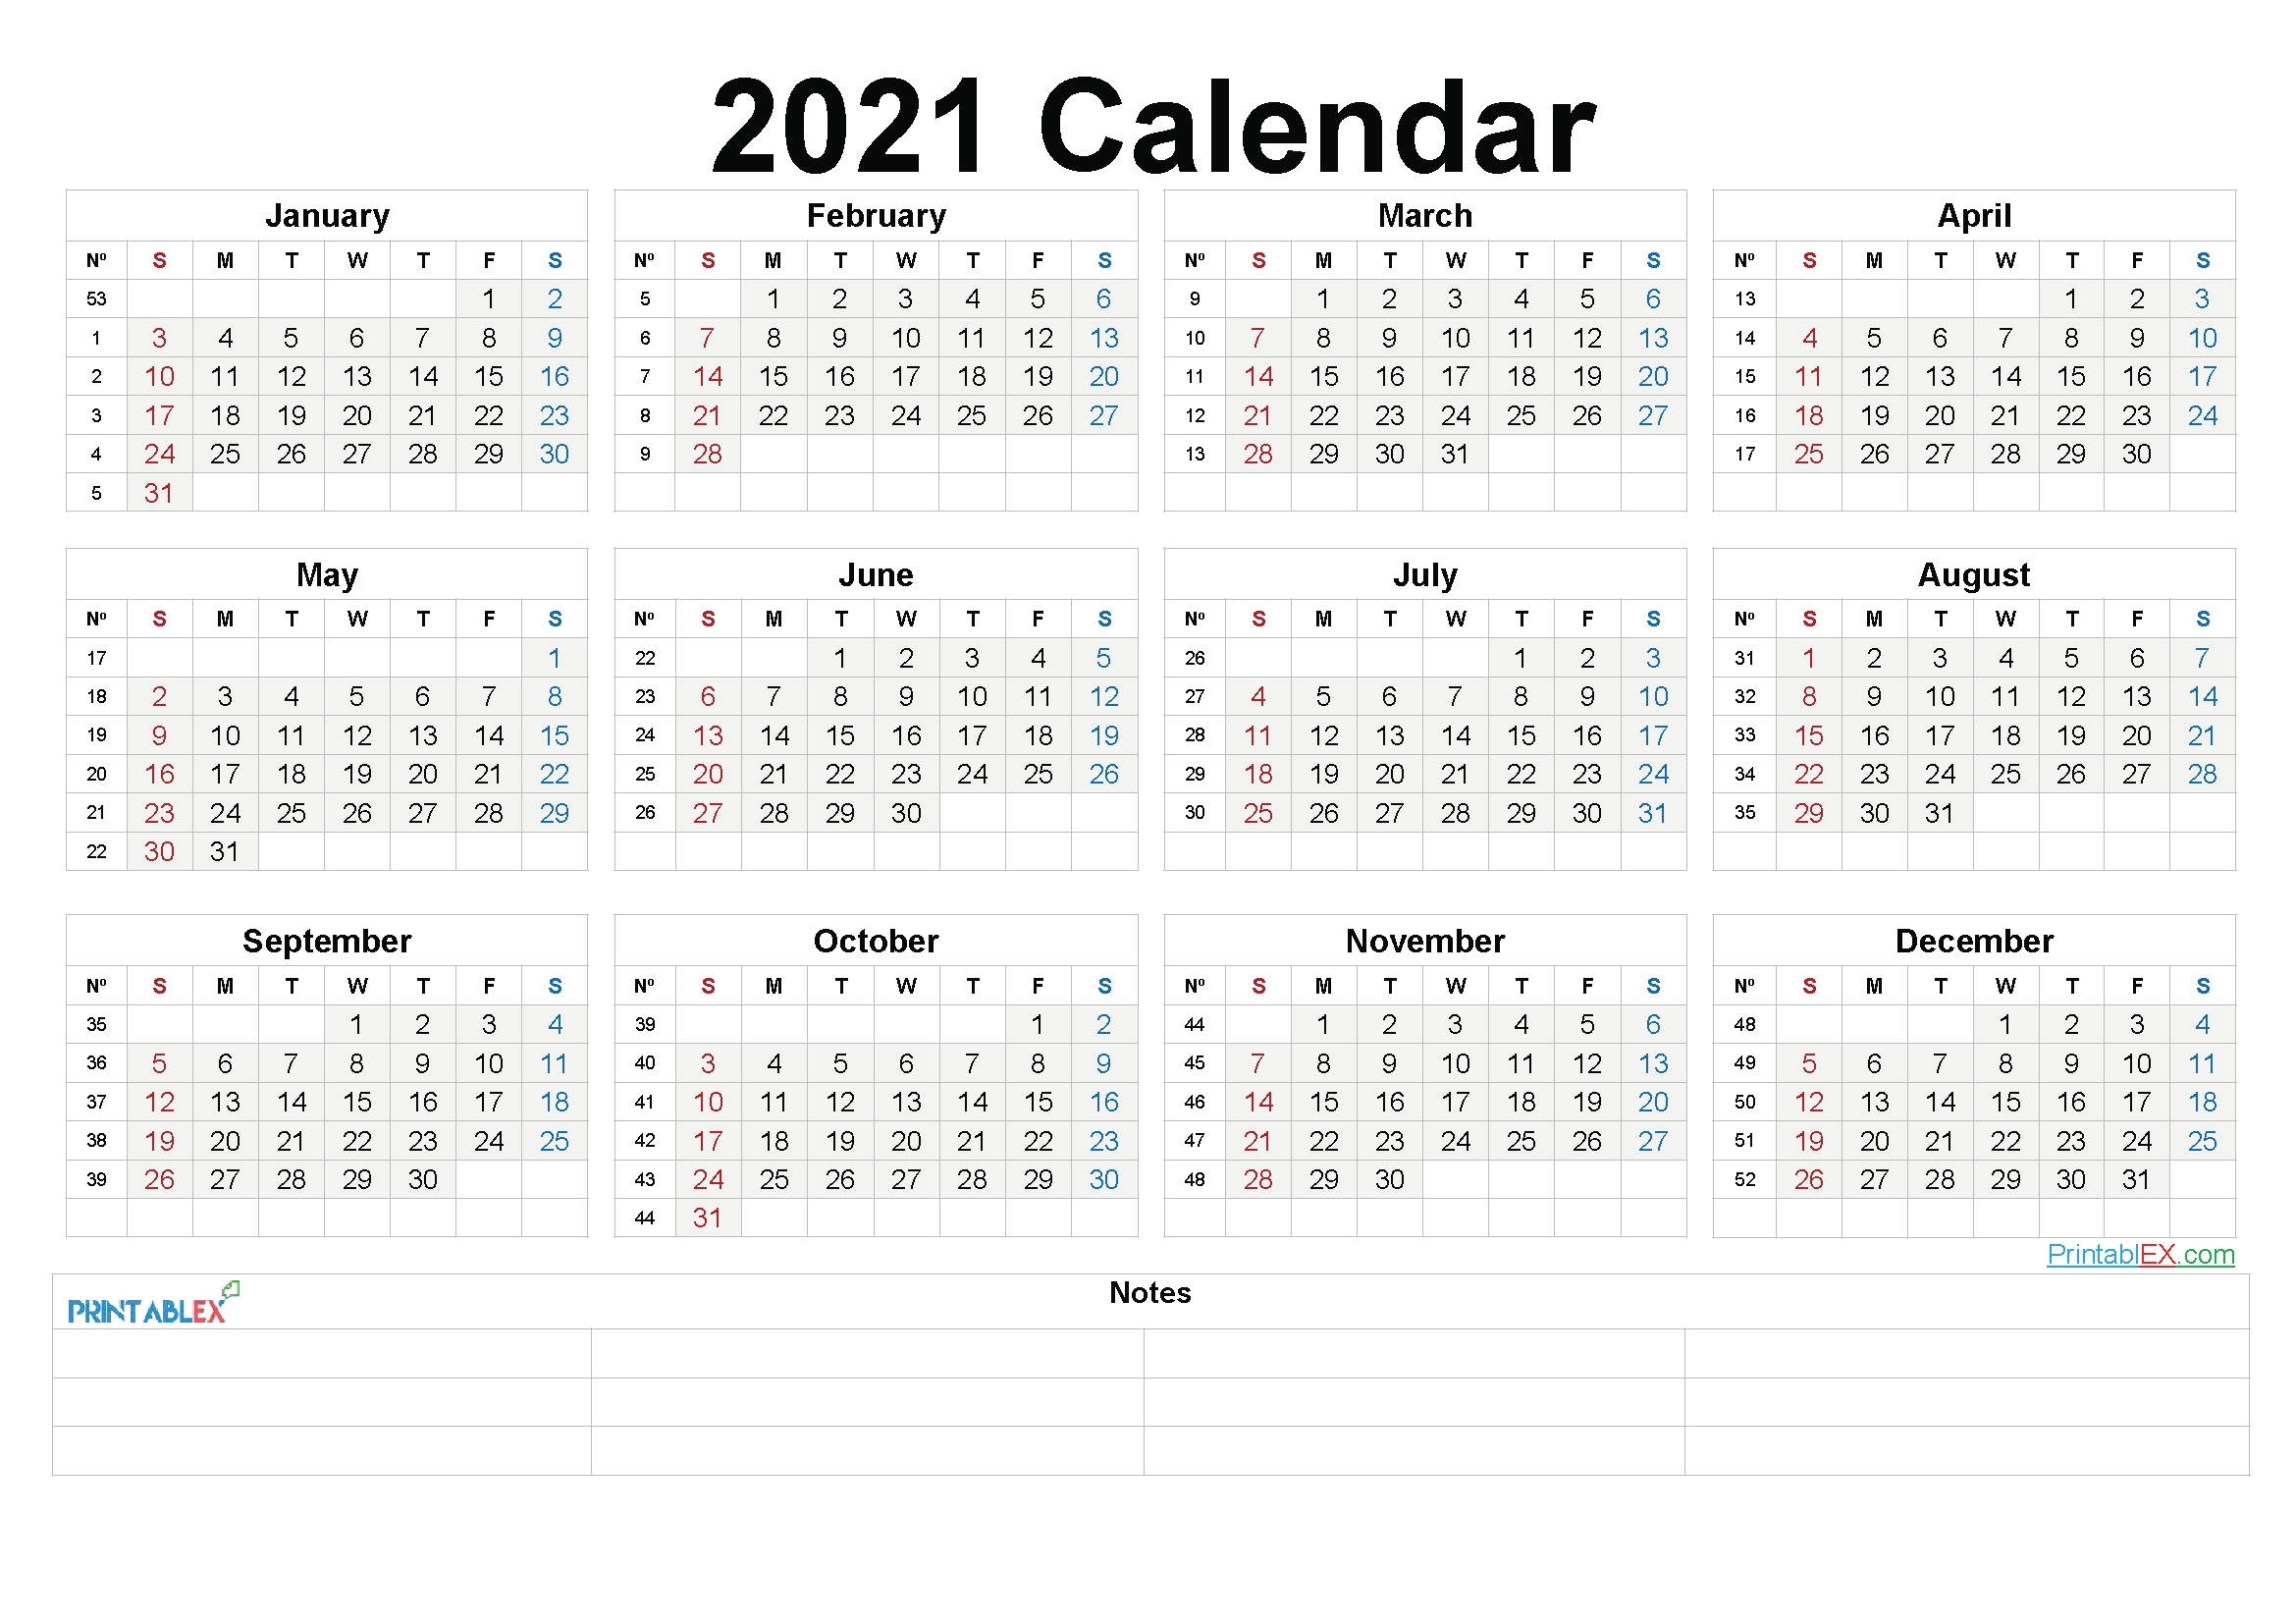 Catch 2021 Philippine Calendar With Holidays